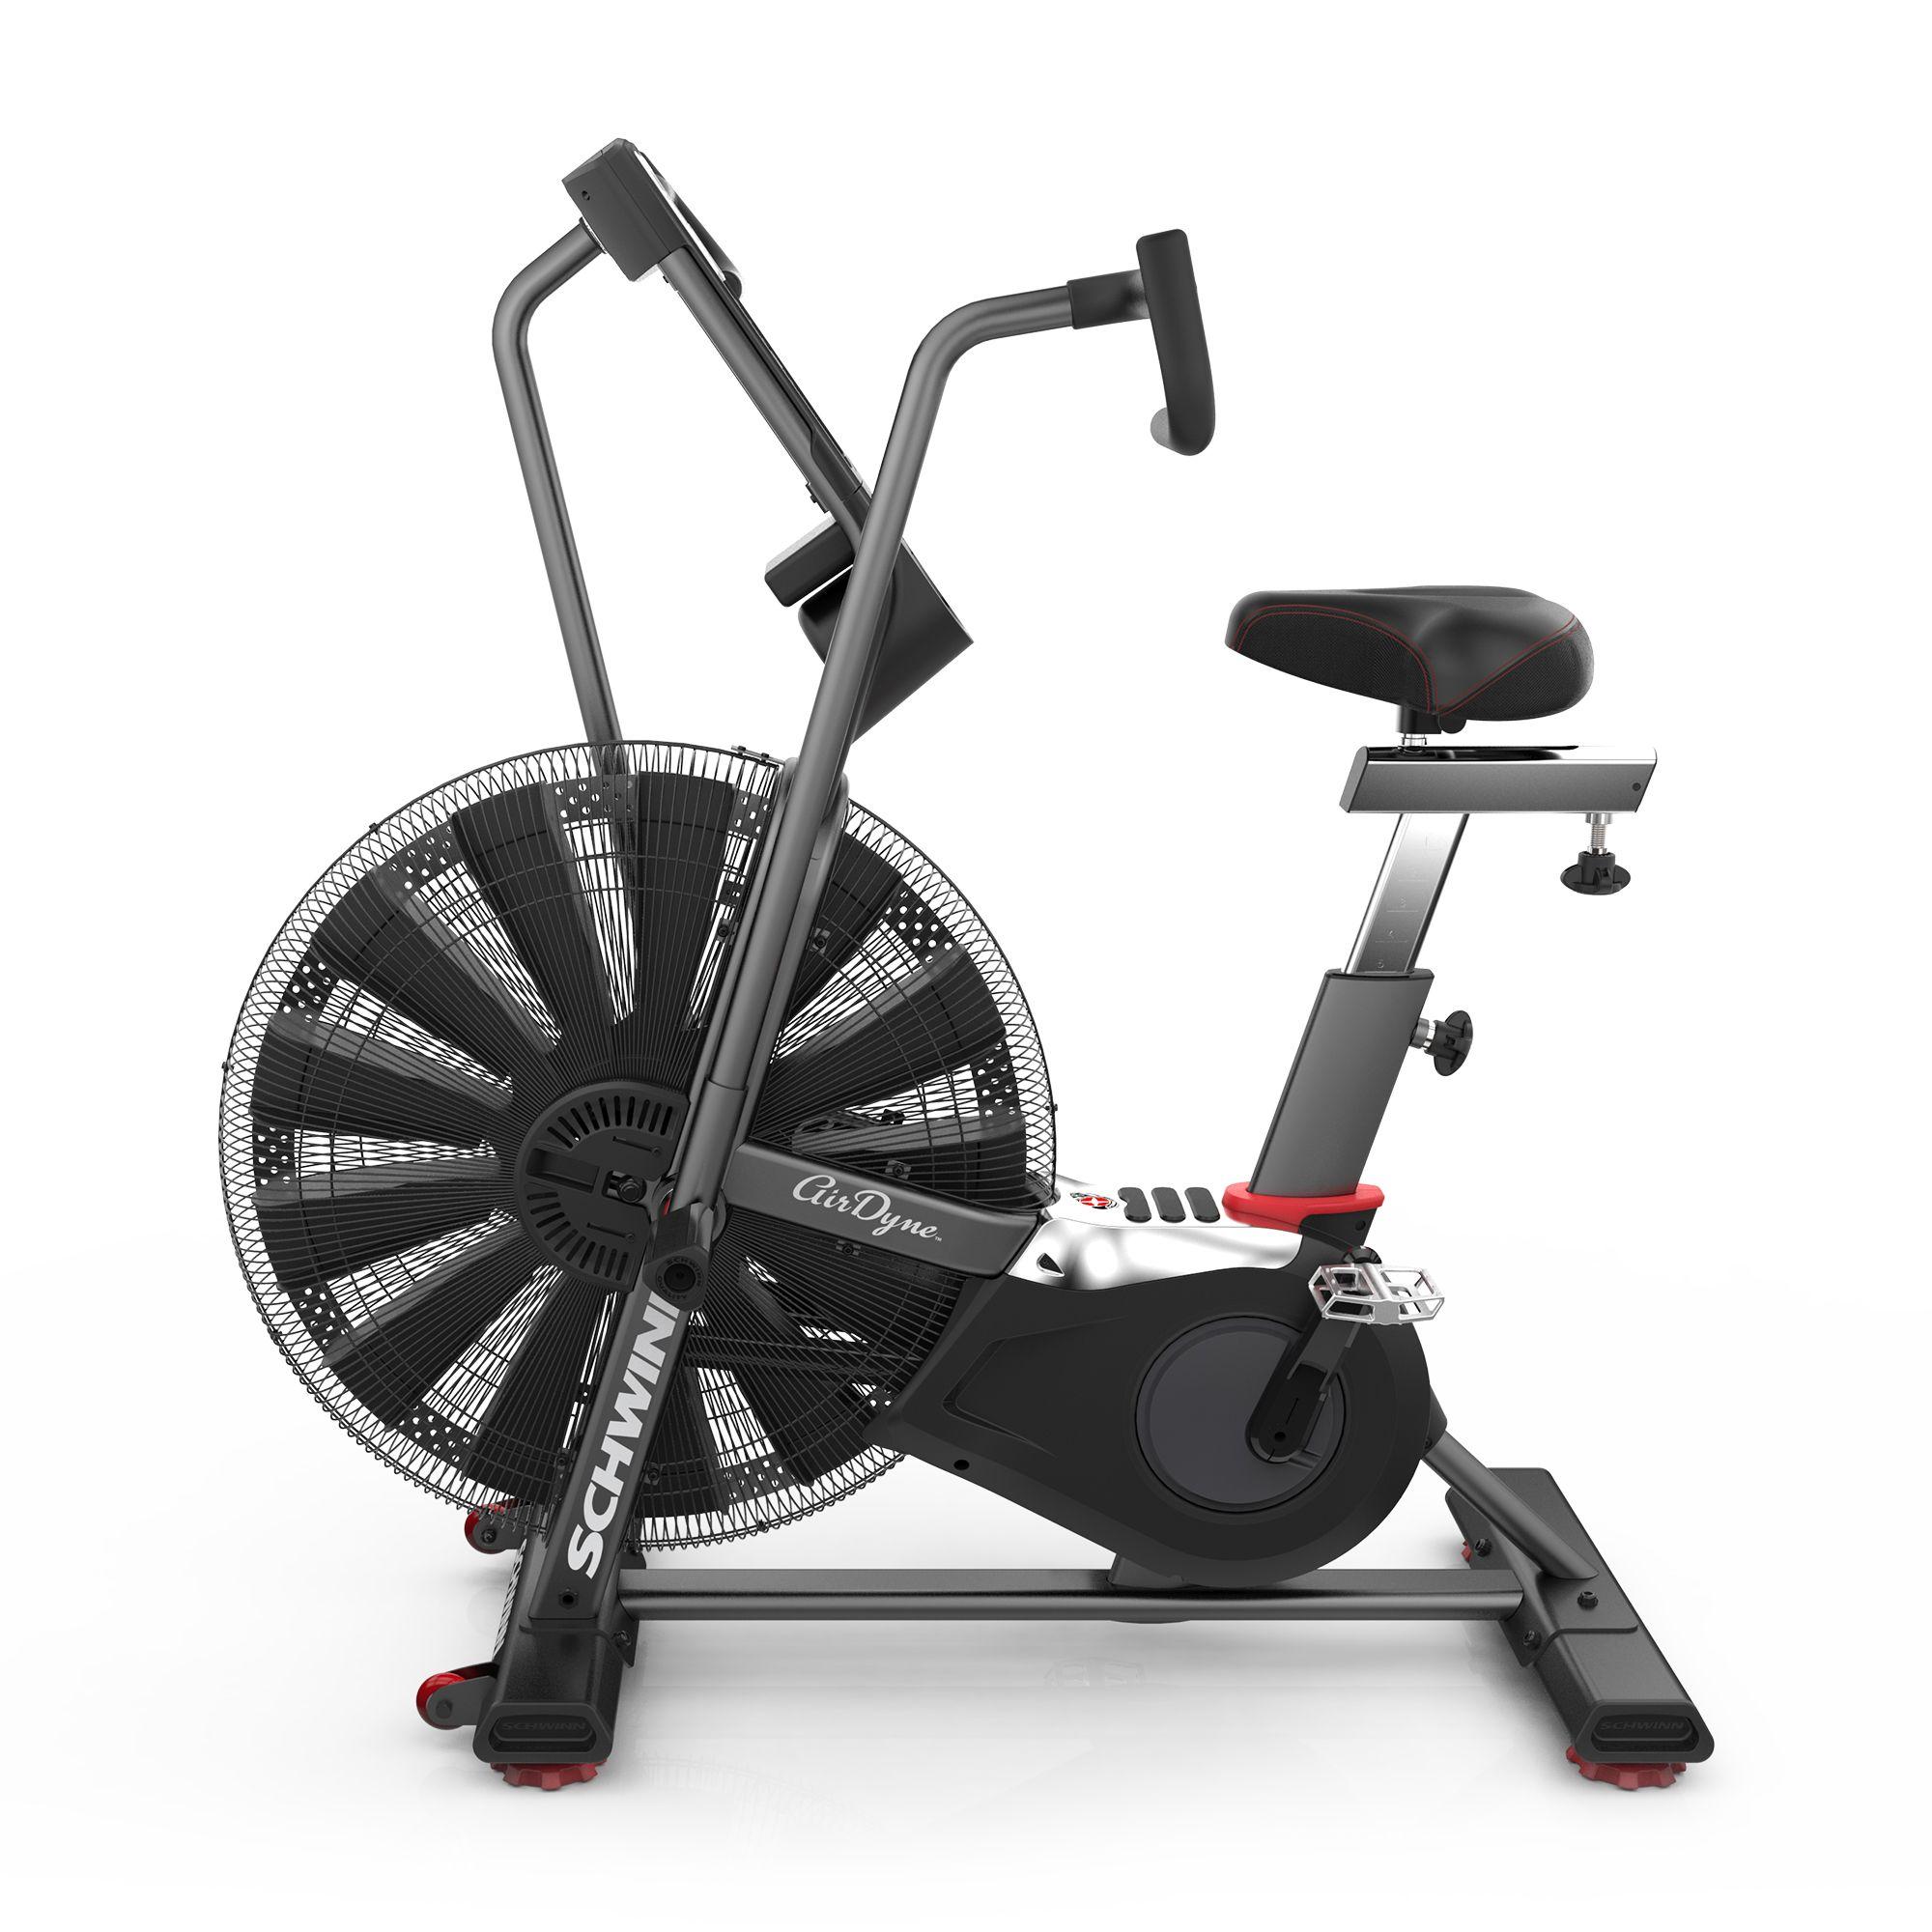 Schwinn Airdyne Ad7 Biking Workout Crossfit Equipment Exercise Bikes